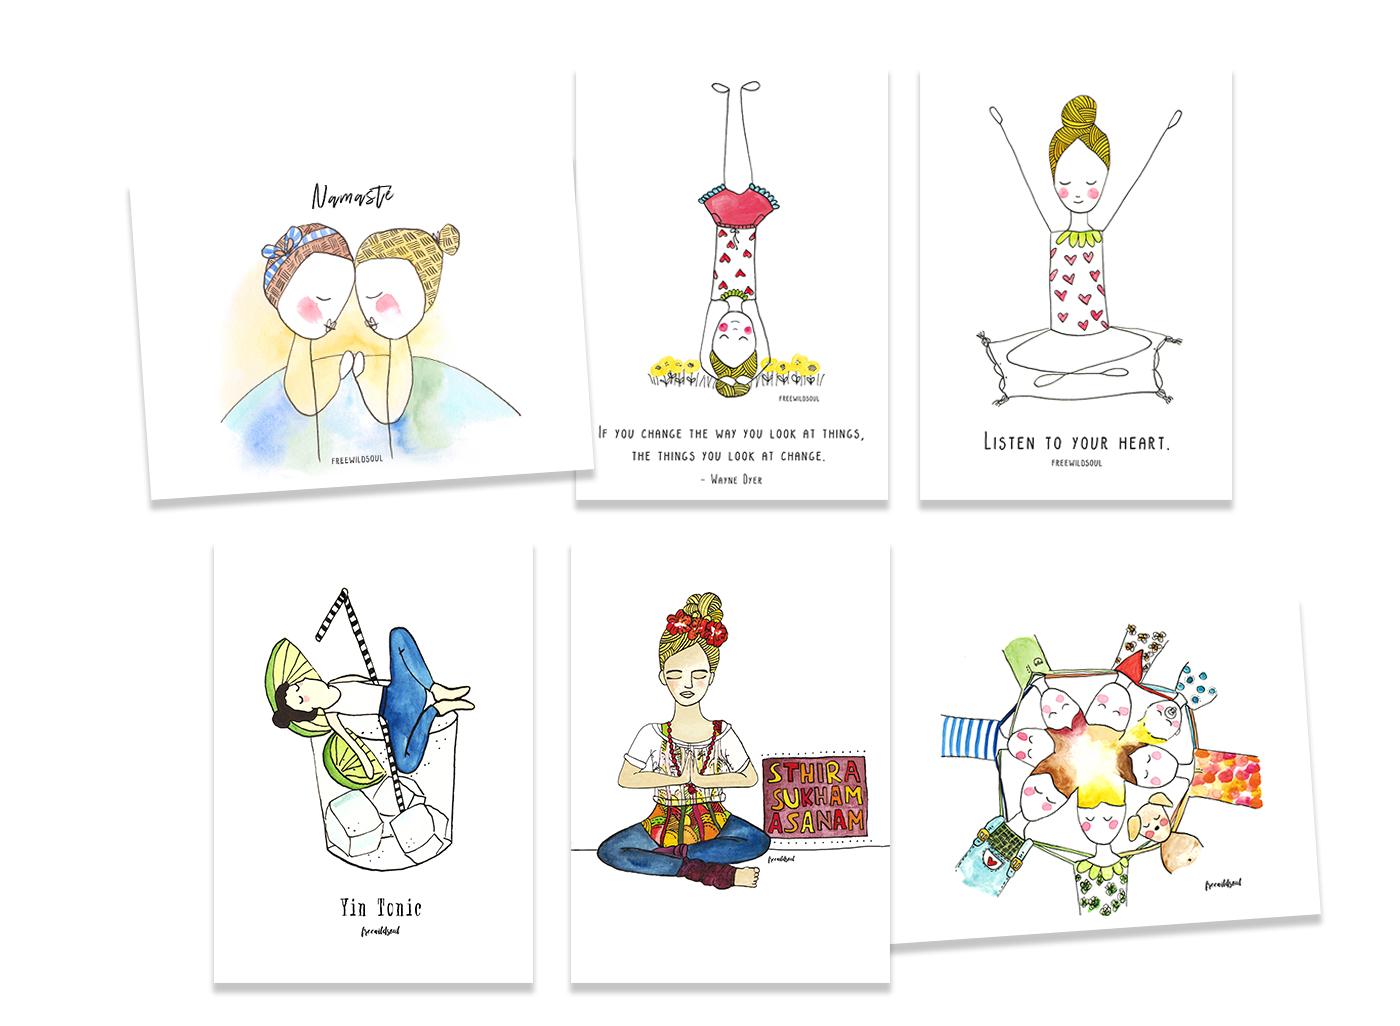 wellbeing_postcards_illustration_stefanie_hertel_freewildsoul